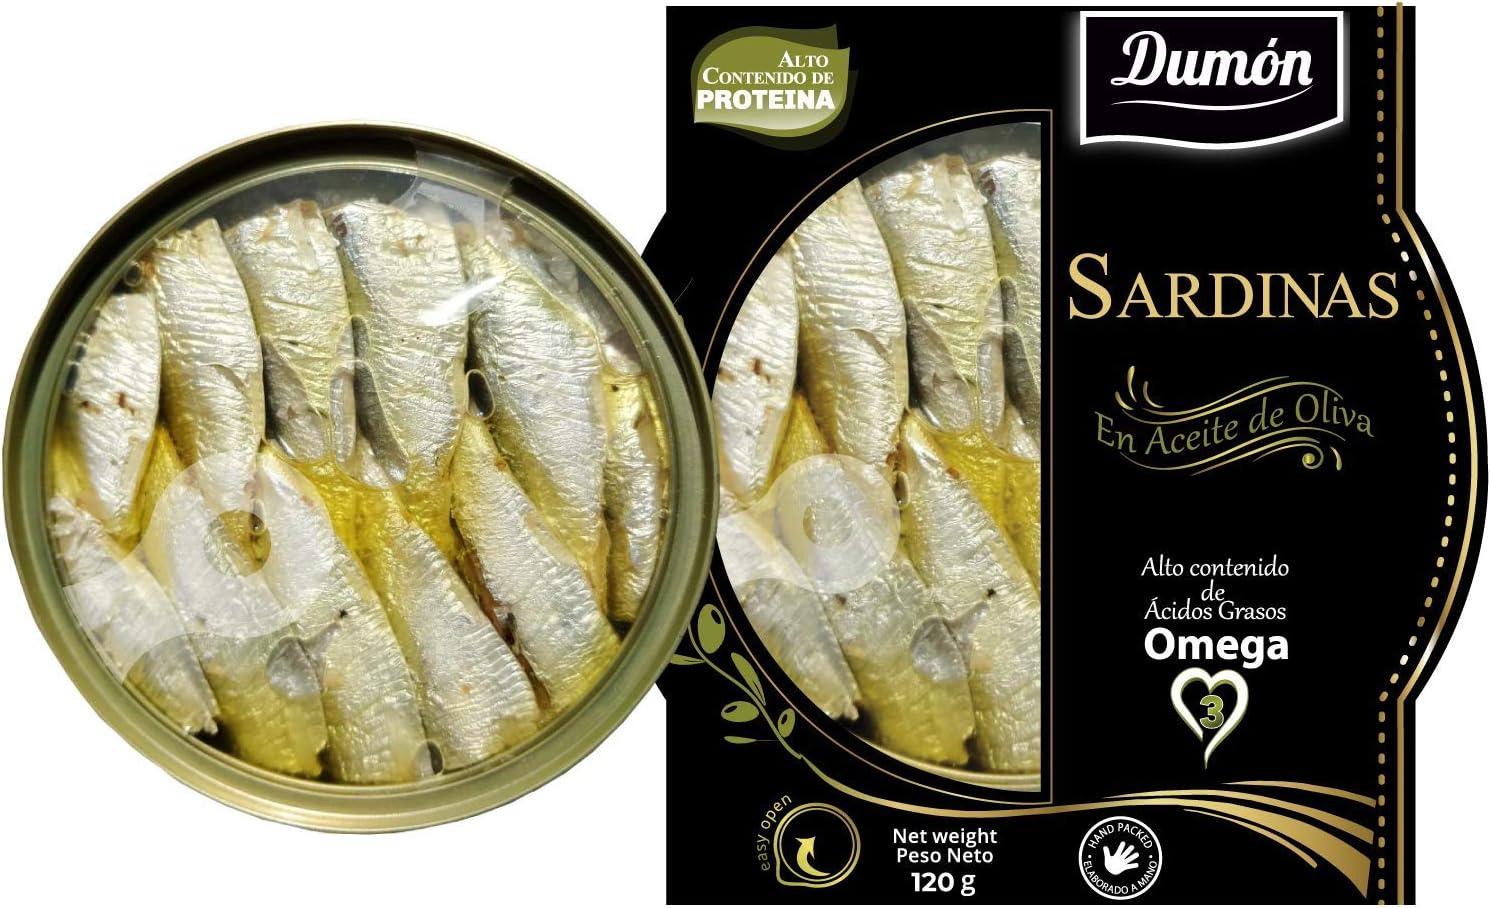 Dumon - 14 Unidades de 120 gr de Conserva de Sardina en Aceite de Oliva, Exclusivo Formato Transparente con Abre Fácil, Conserva de Pescado en Lata ...